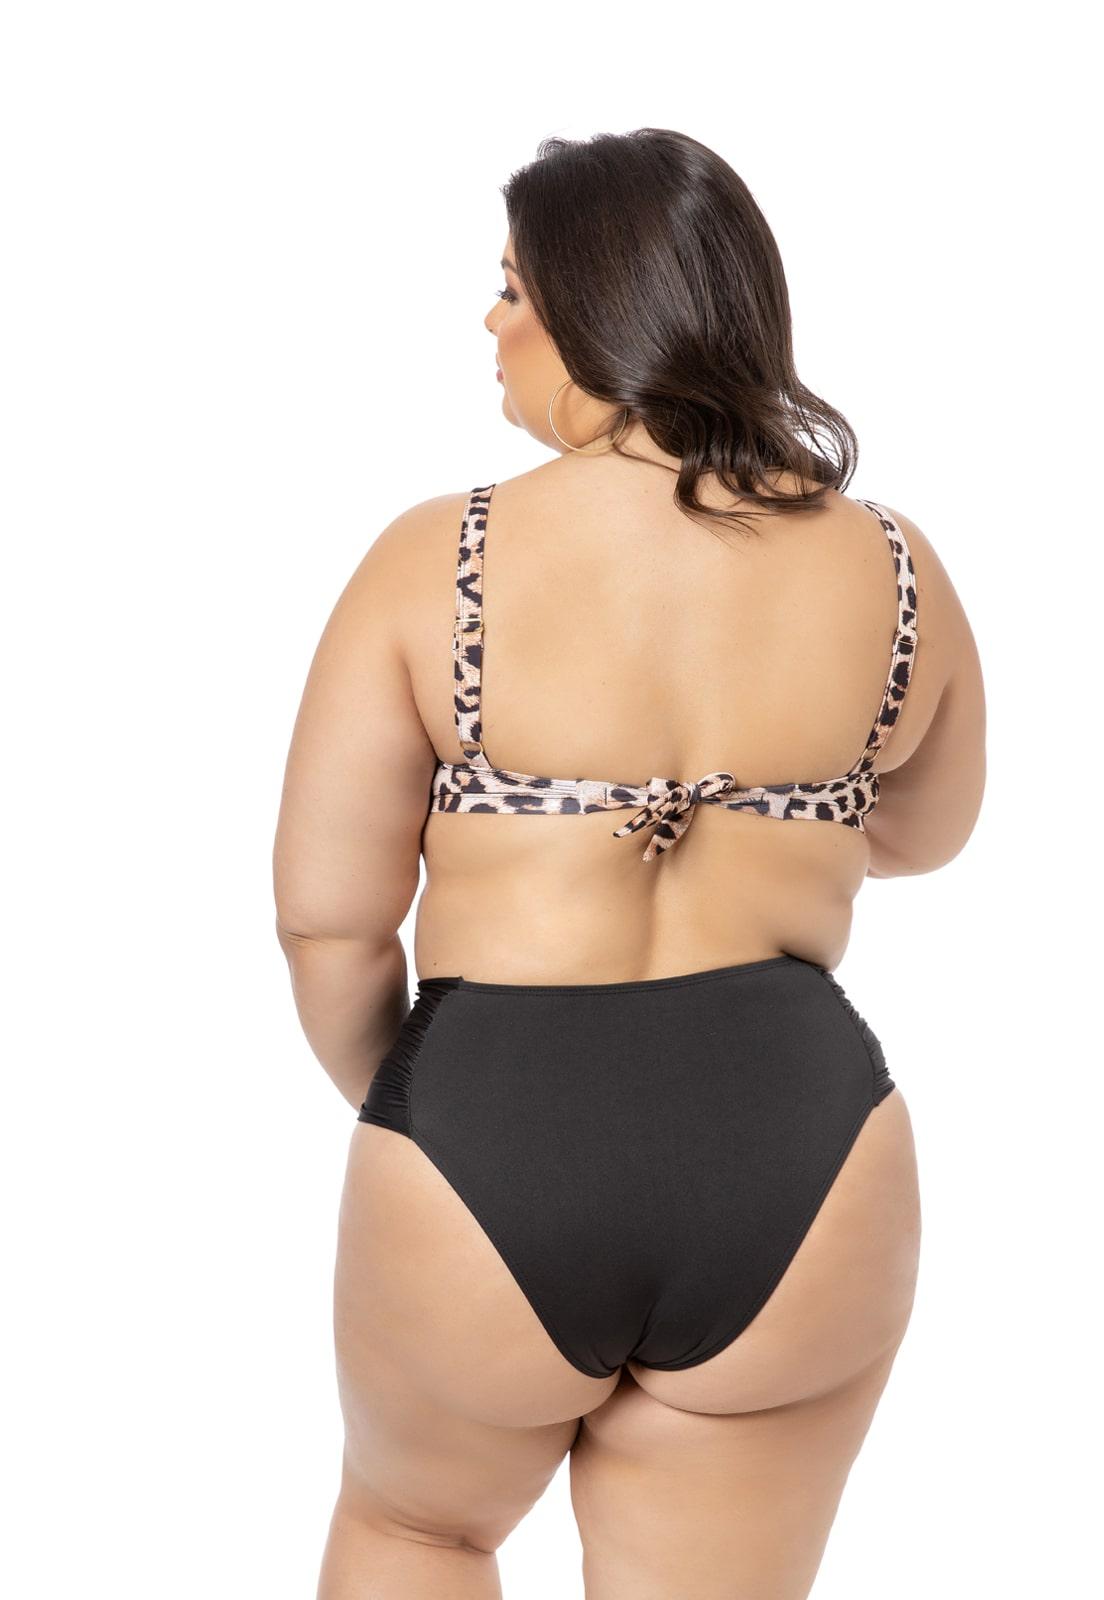 Sutiã Biquíni Bojo Estampa Leopardo Plus Size